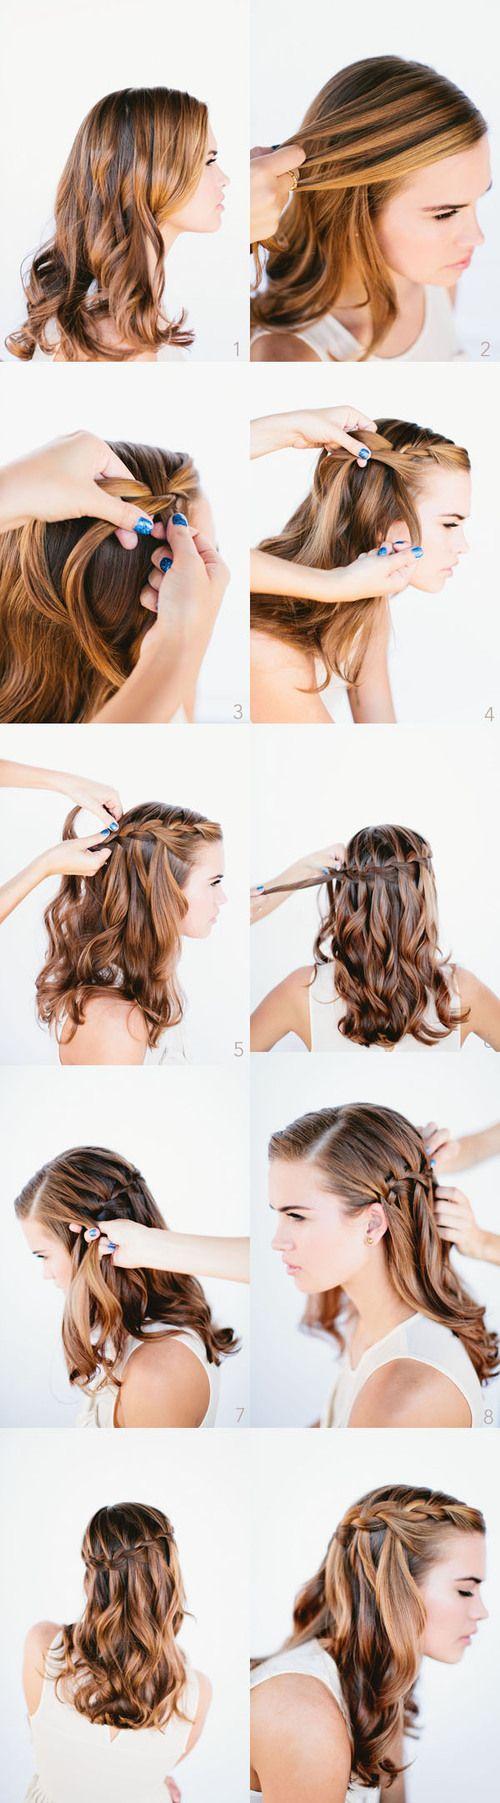 best 25+ waterfall braid curls ideas on pinterest | waterfall